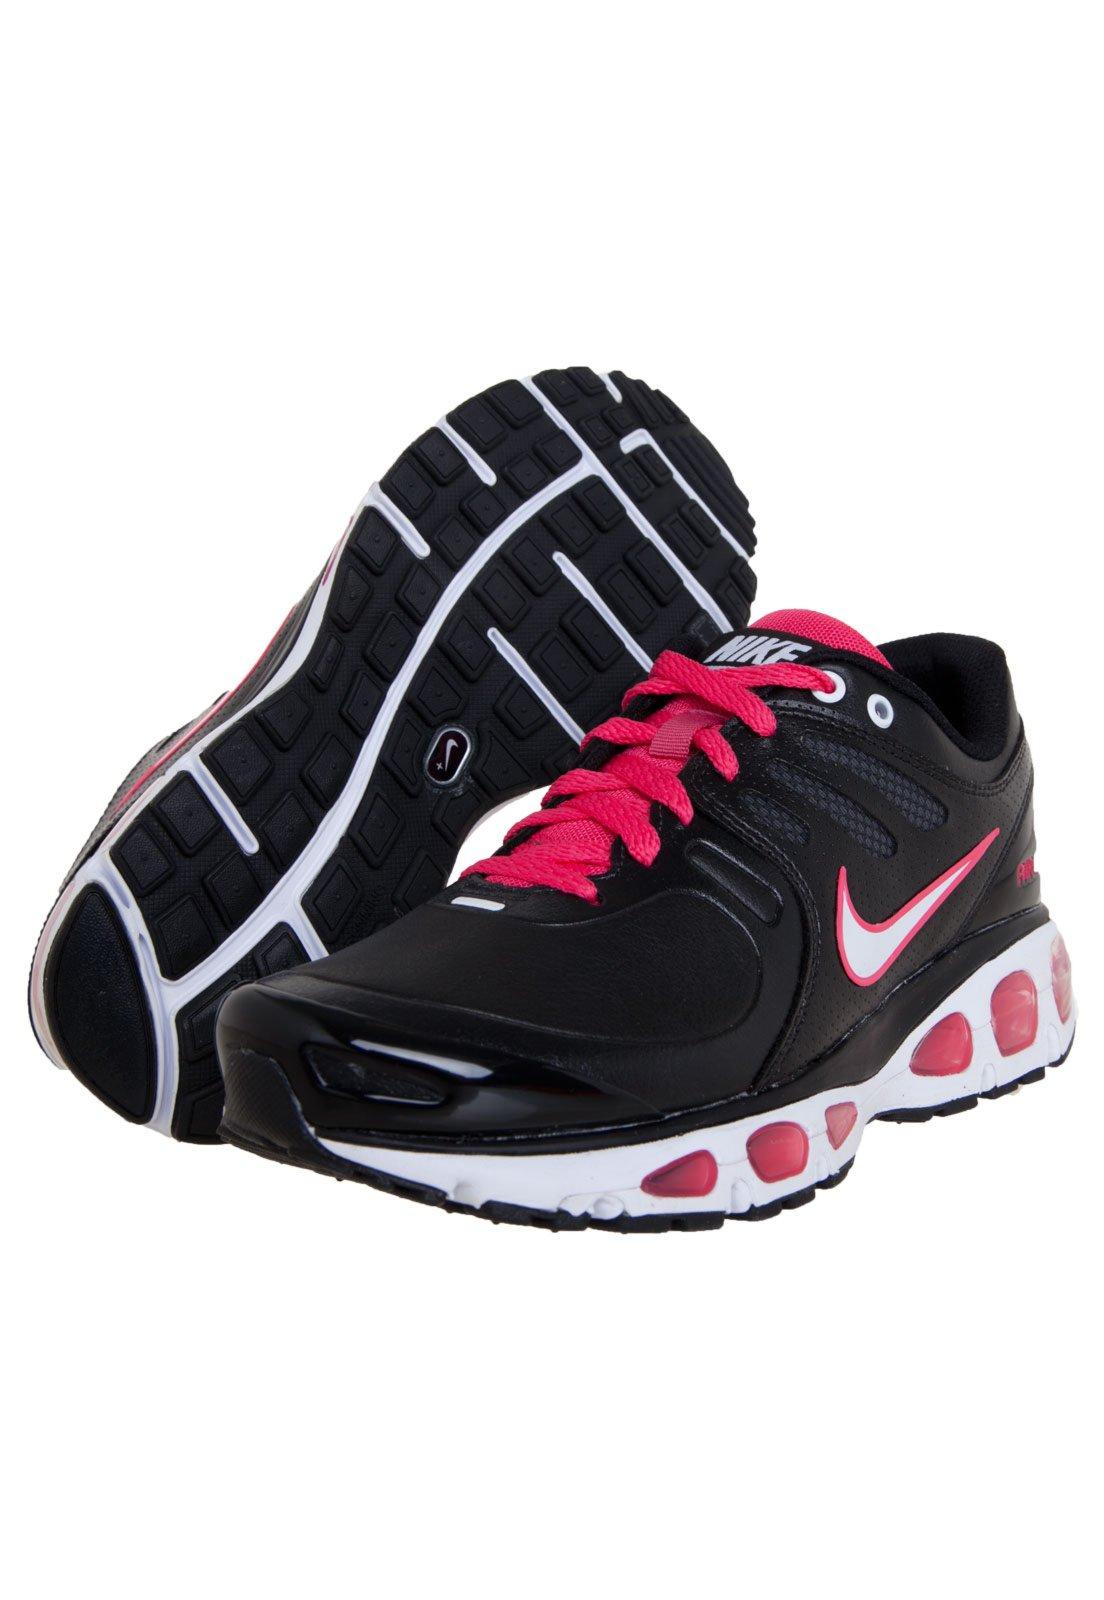 Tênis Nike Air Max Tailwind 2010 Sl Feminino Centauro